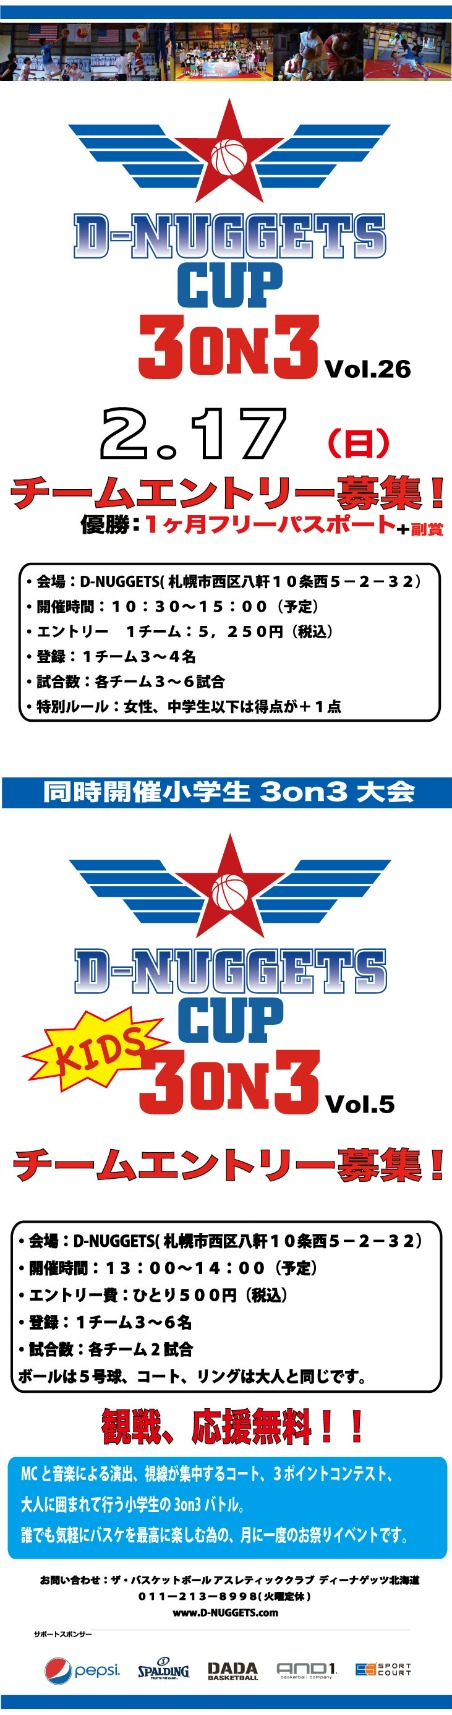 D-NUGGETS-CUP-HOKKAIDO%E3%80%80Vol.26.jpg